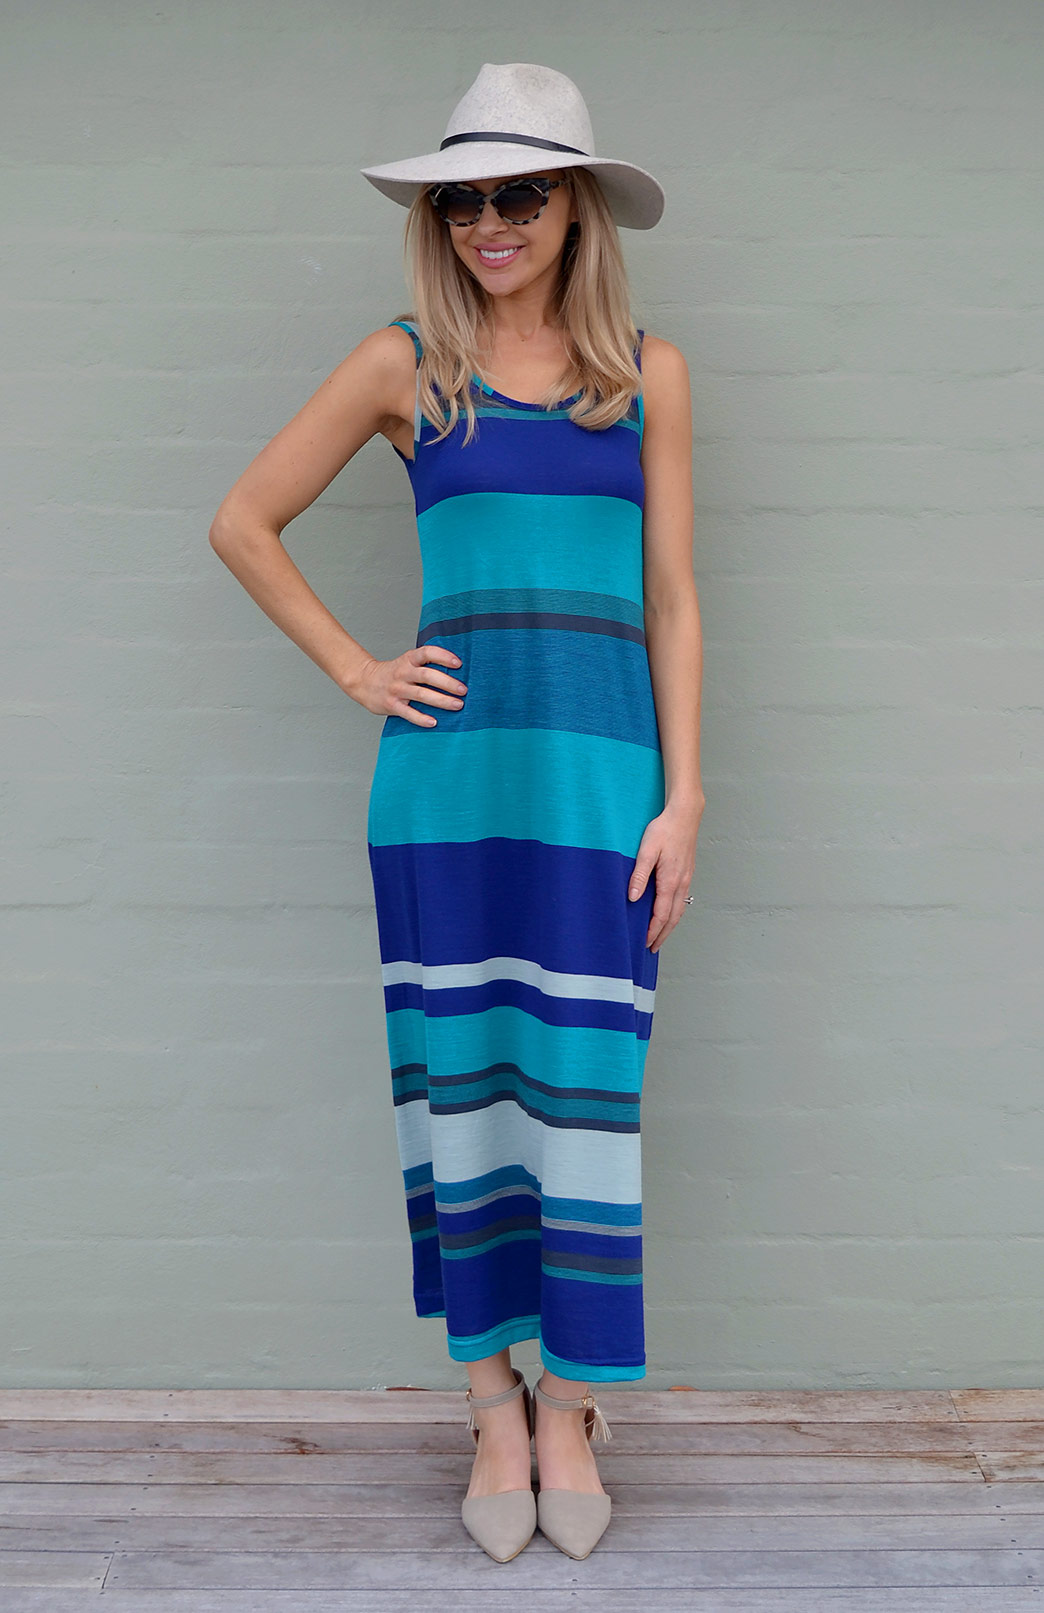 Maxi Dress - Multi Striped - Women's Merino Wool Blue and Teal Multi Striped Maxi Dress with Scoop Neckline - Smitten Merino Tasmania Australia